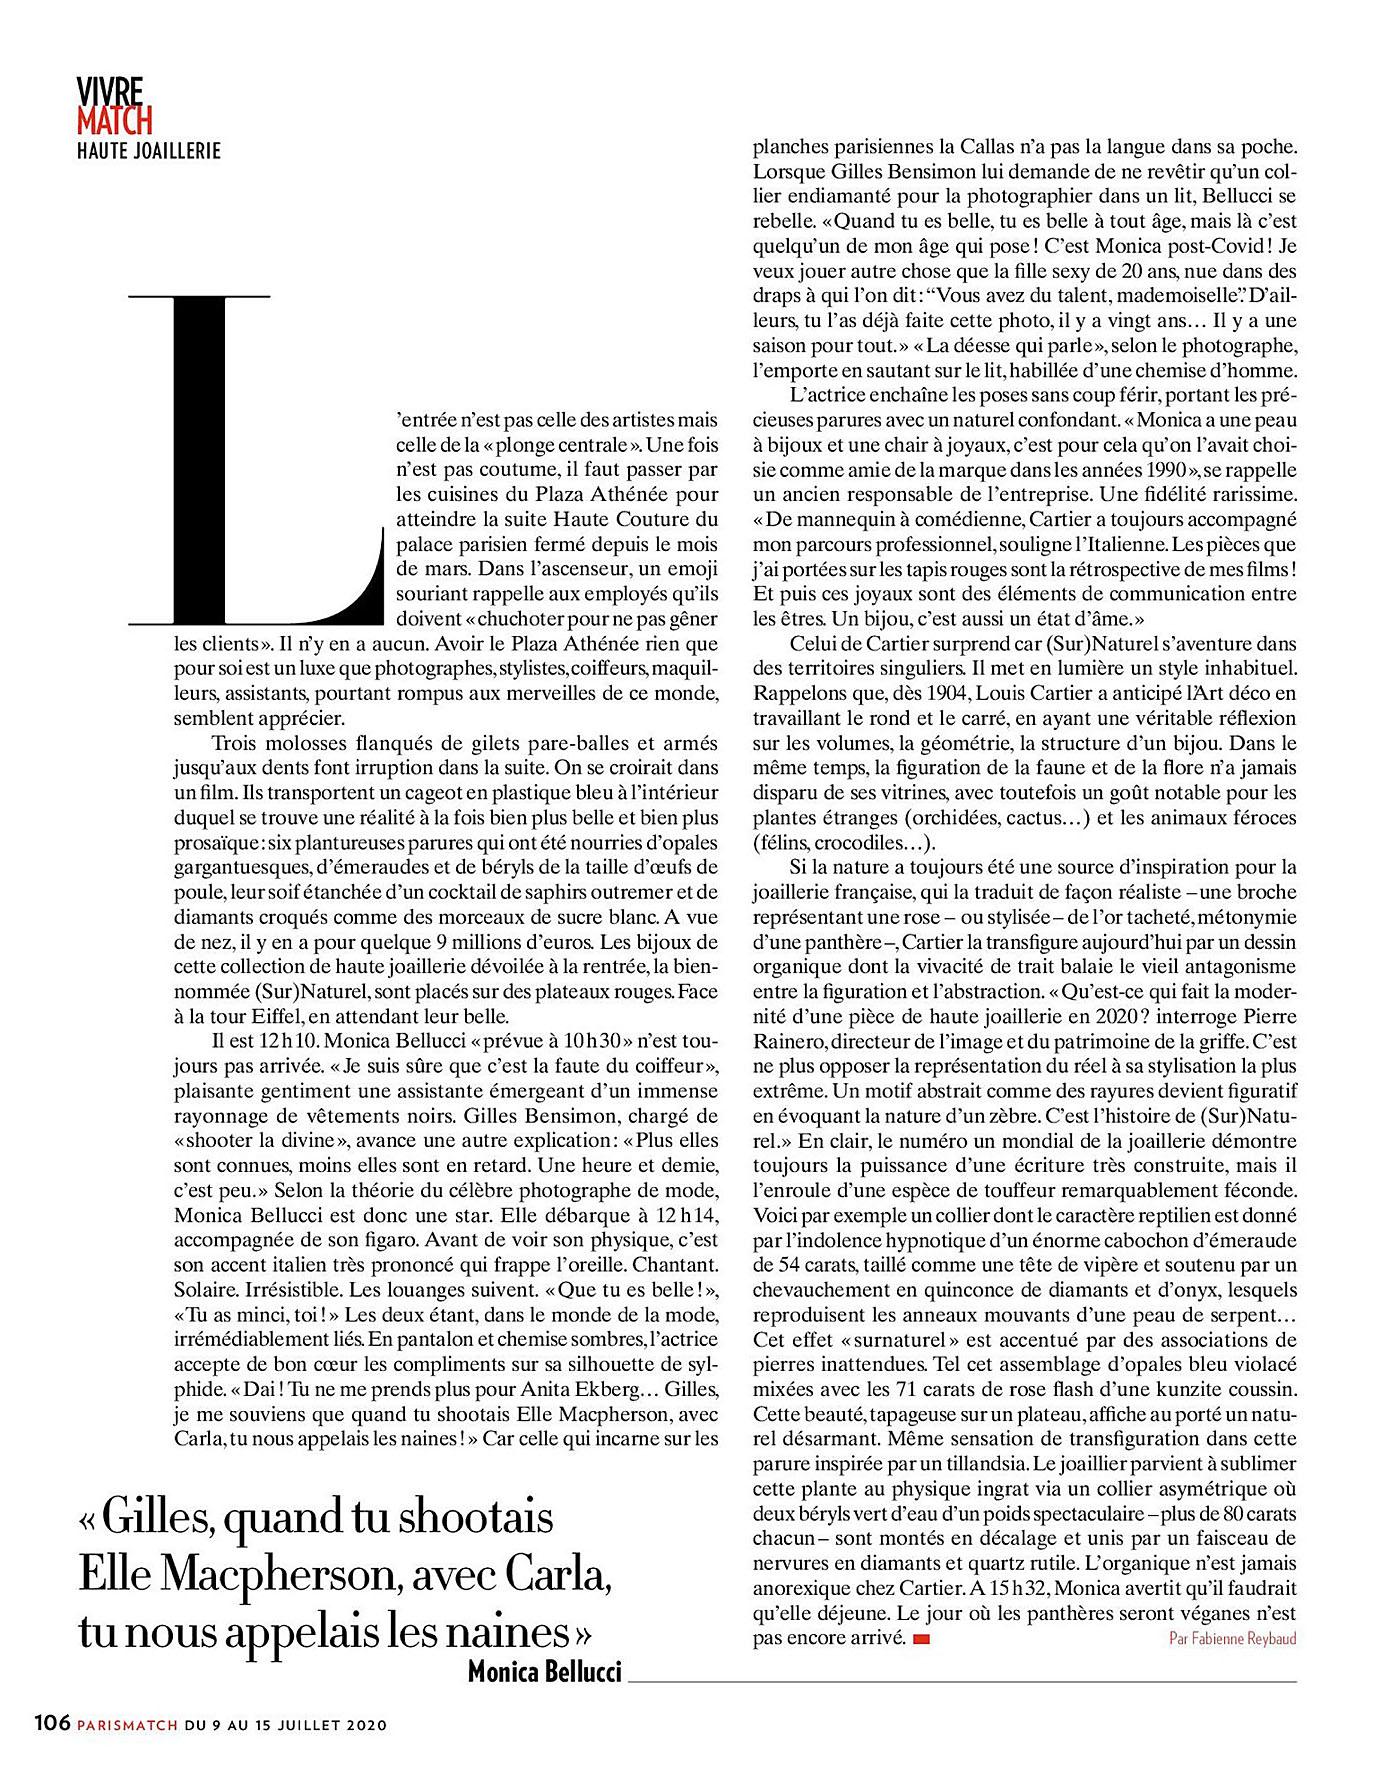 Paris Match 200709 MBellucci 03.jpg